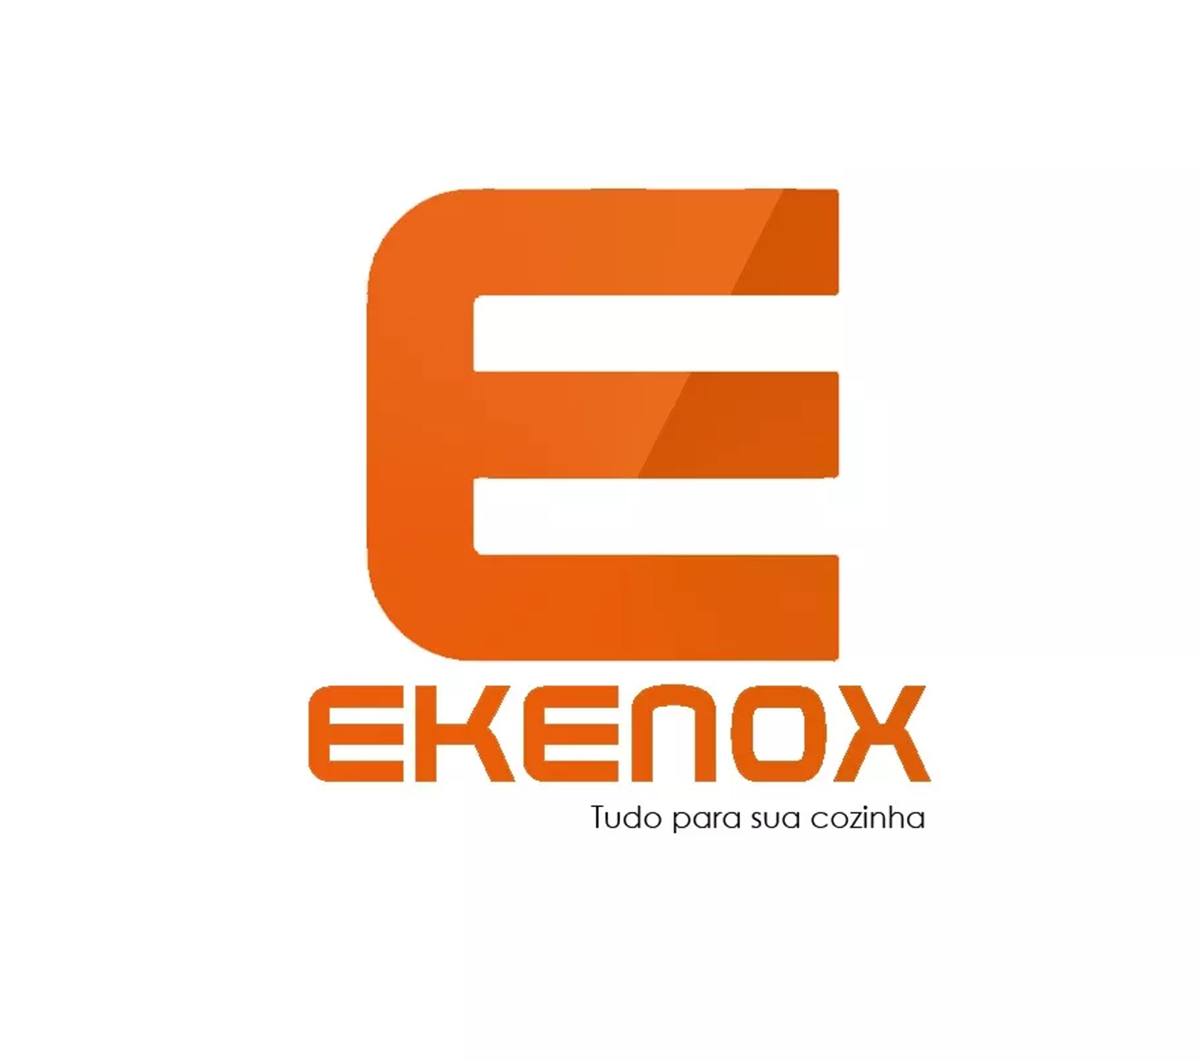 Kit 2 Porta Moedas Perueiro  - EKENOX- Equipamentos Industriais